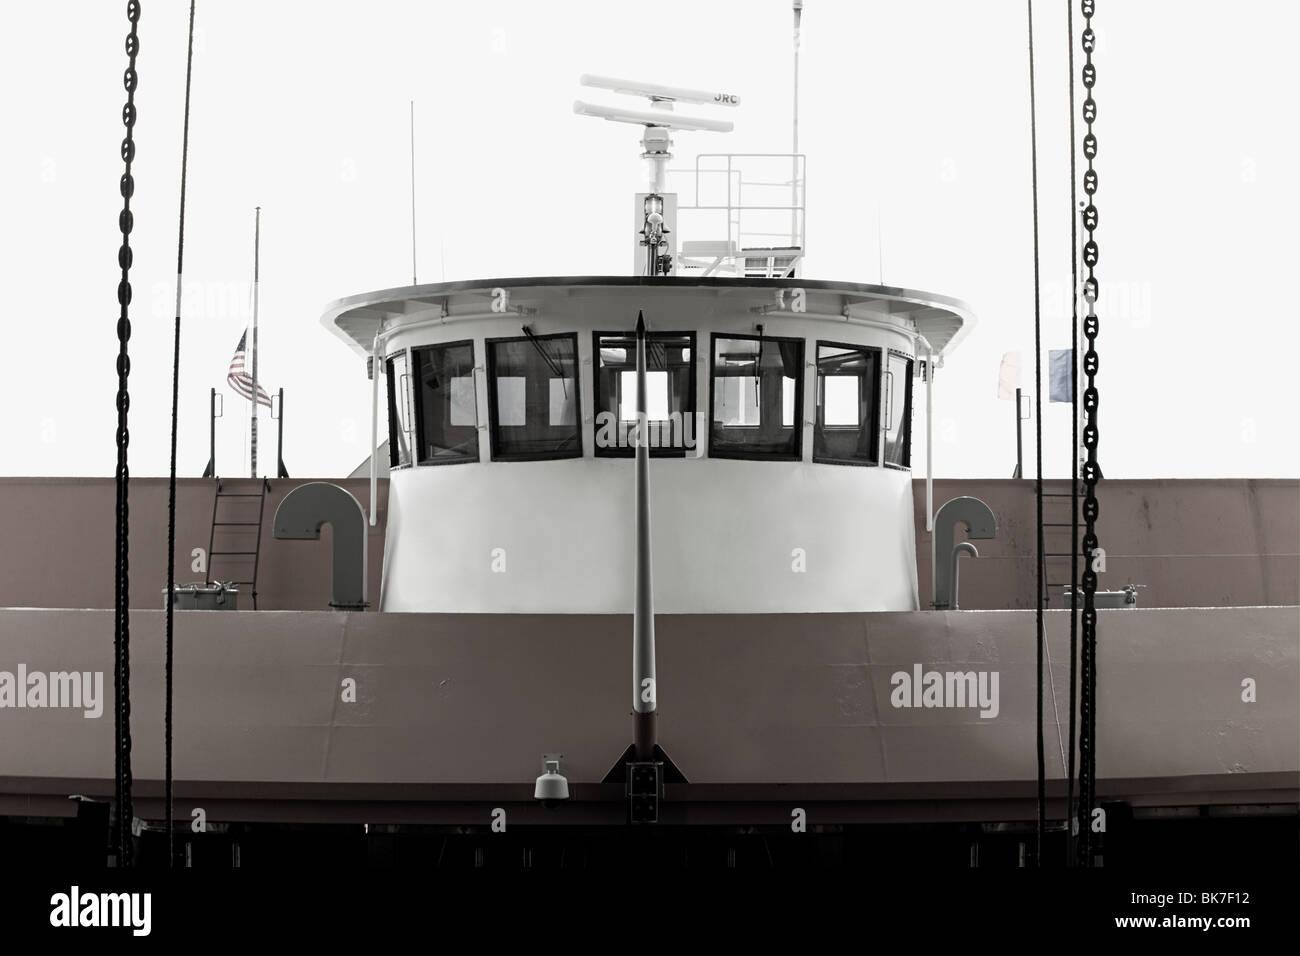 Staten island ferry - Stock Image